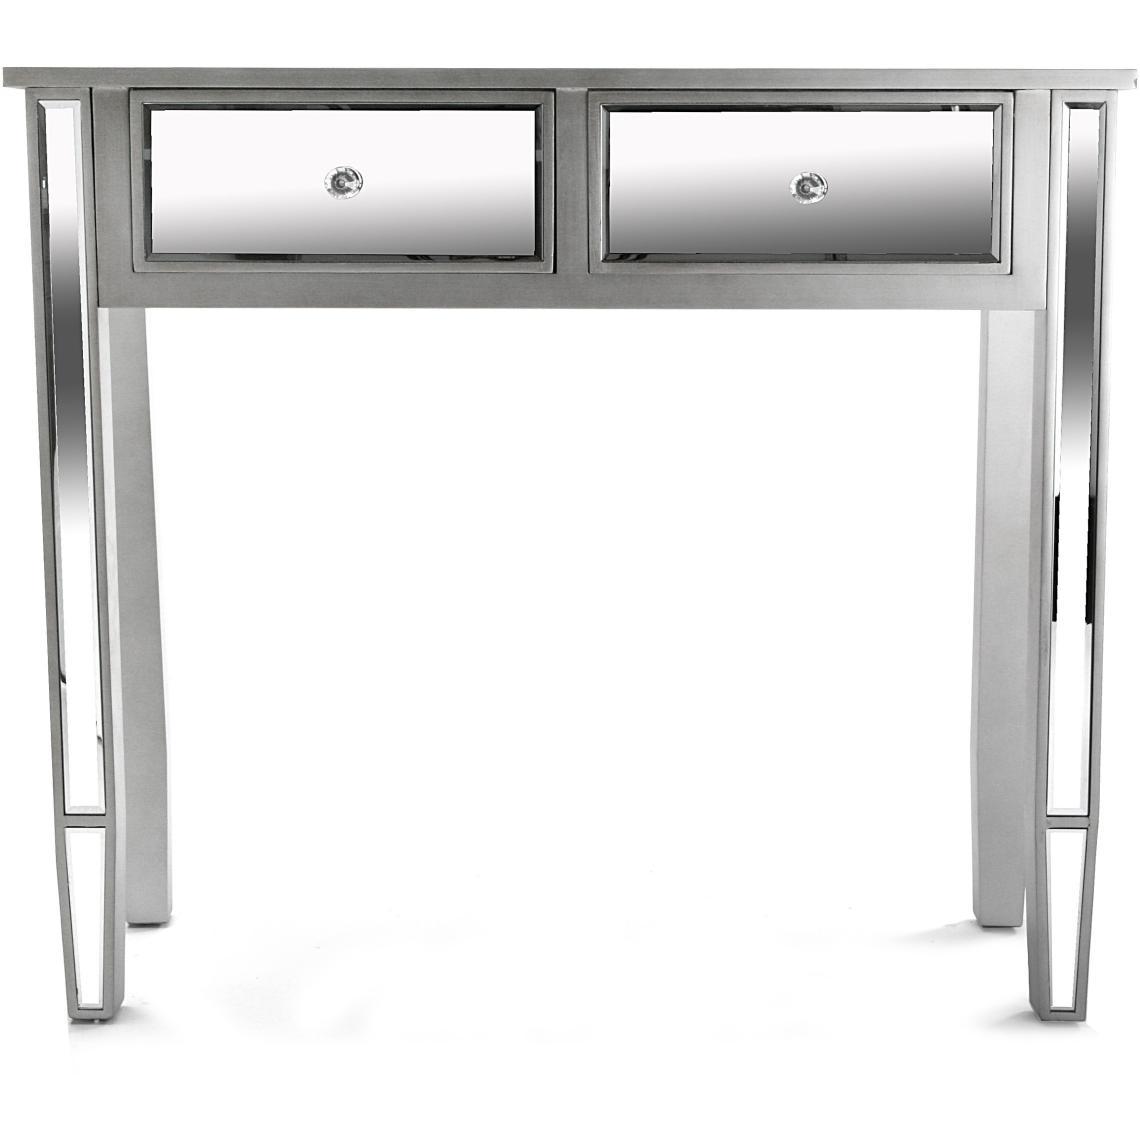 Petite console miroir 2 tiroirs CLEFFA